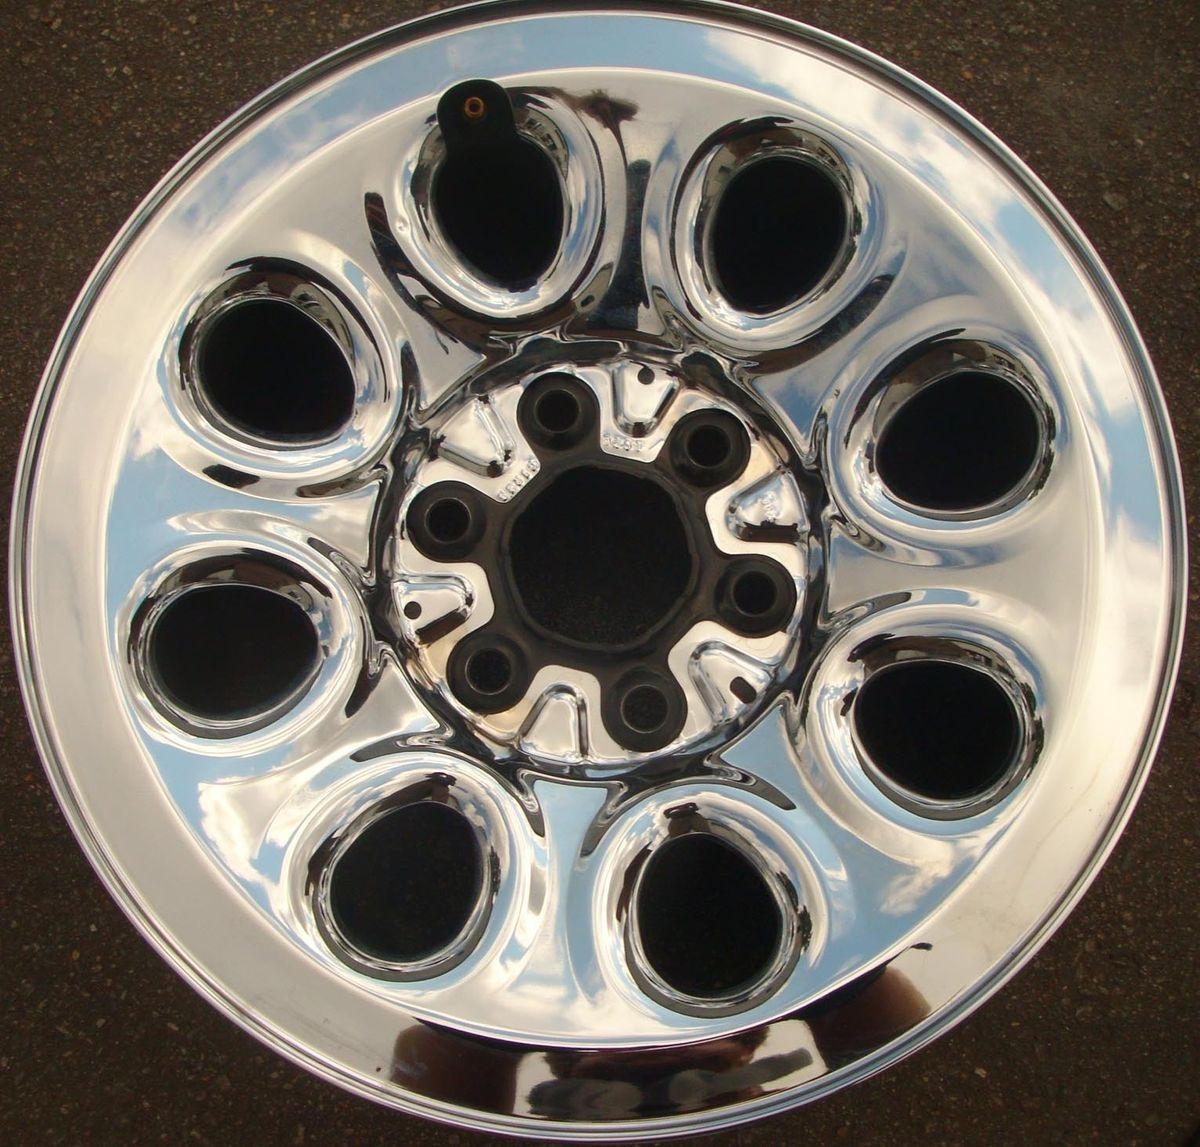 08 09 10 11 Chevrolet Silverado Sierra Chrome Steel Wheel Rim